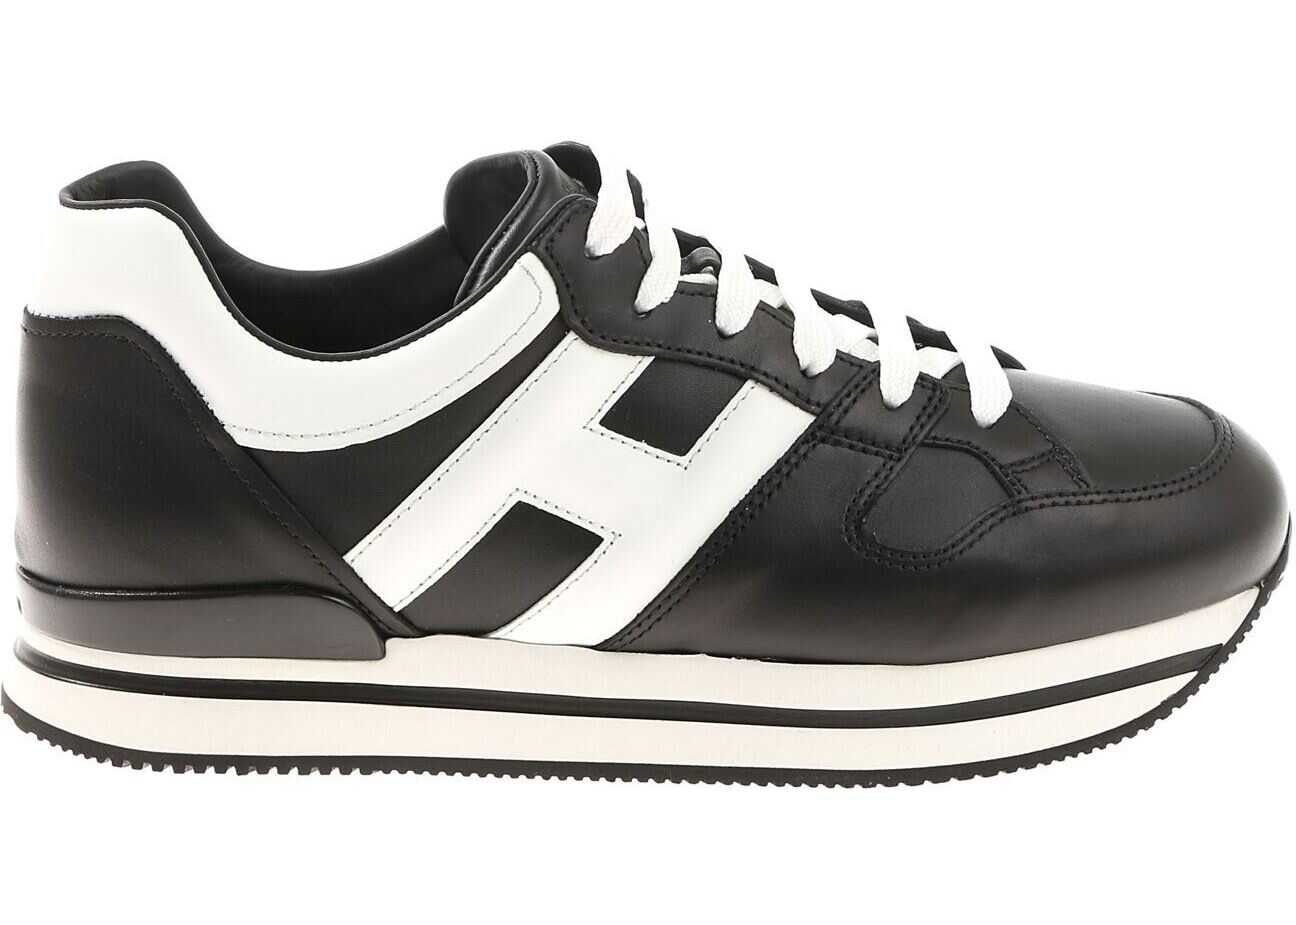 Hogan H222 Black And White Sneakers Black